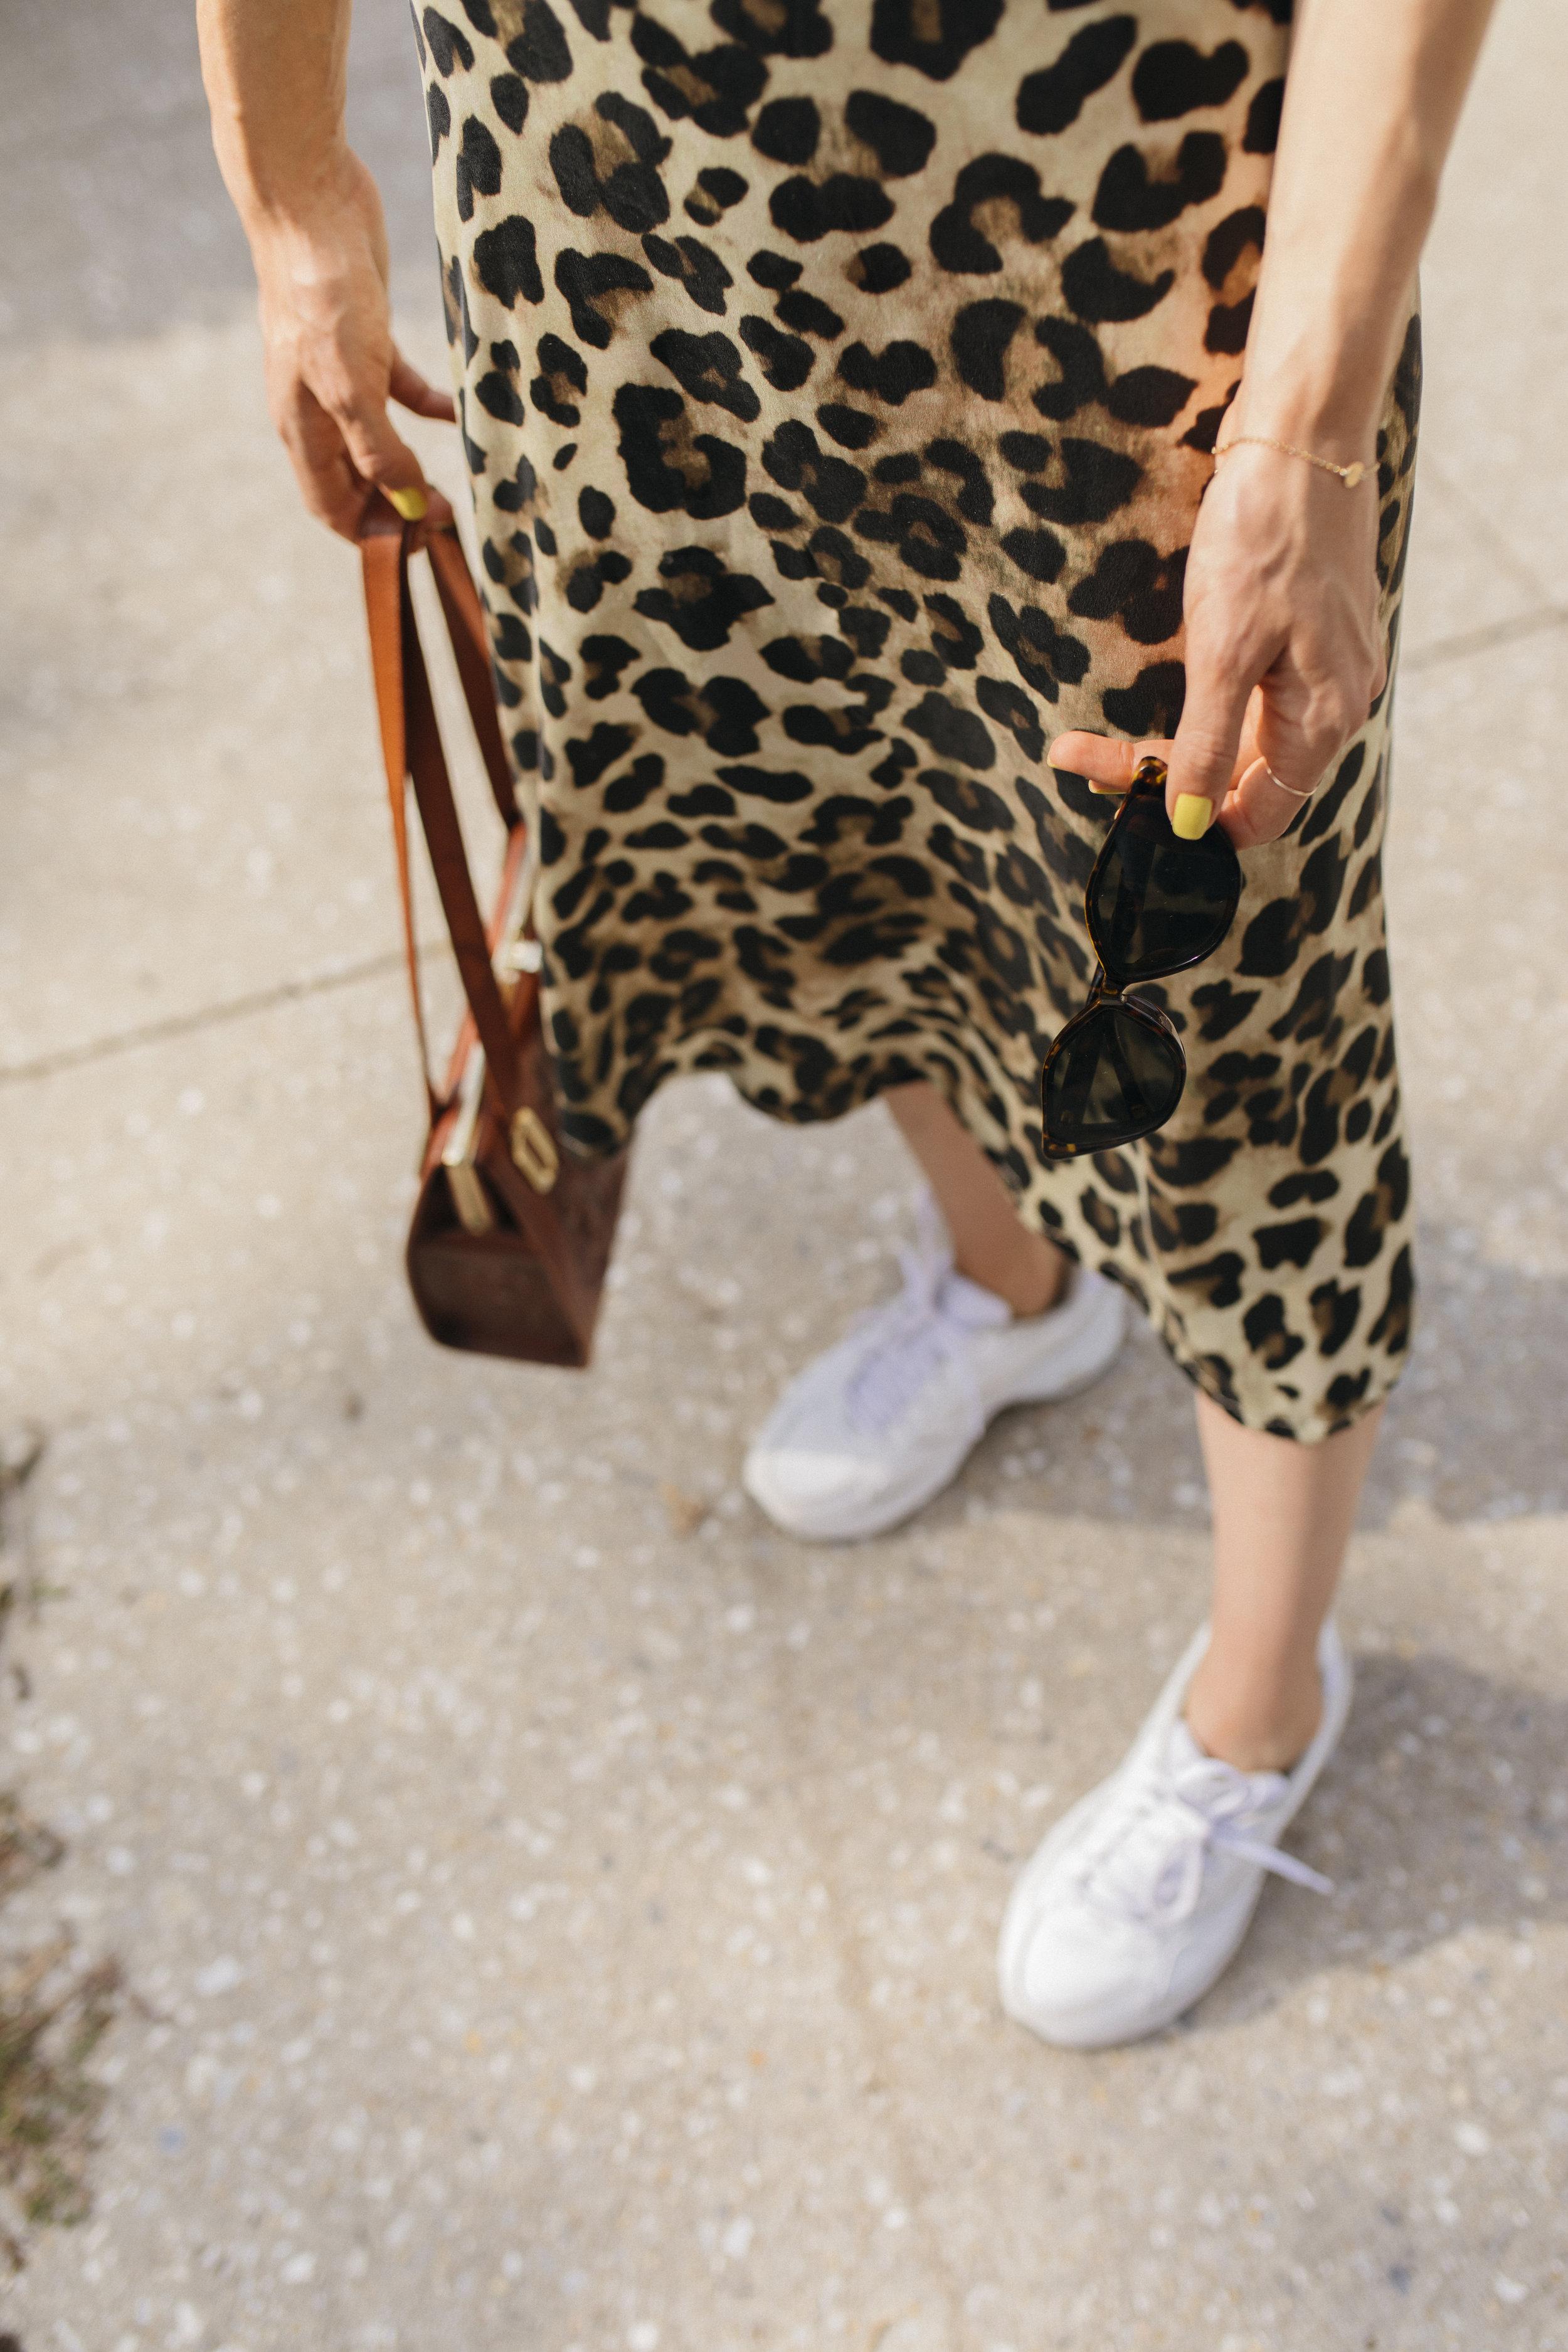 emilyrhess-blog-trends-fashion-leopard-cheetah-skirt-diy-naomi16.jpg